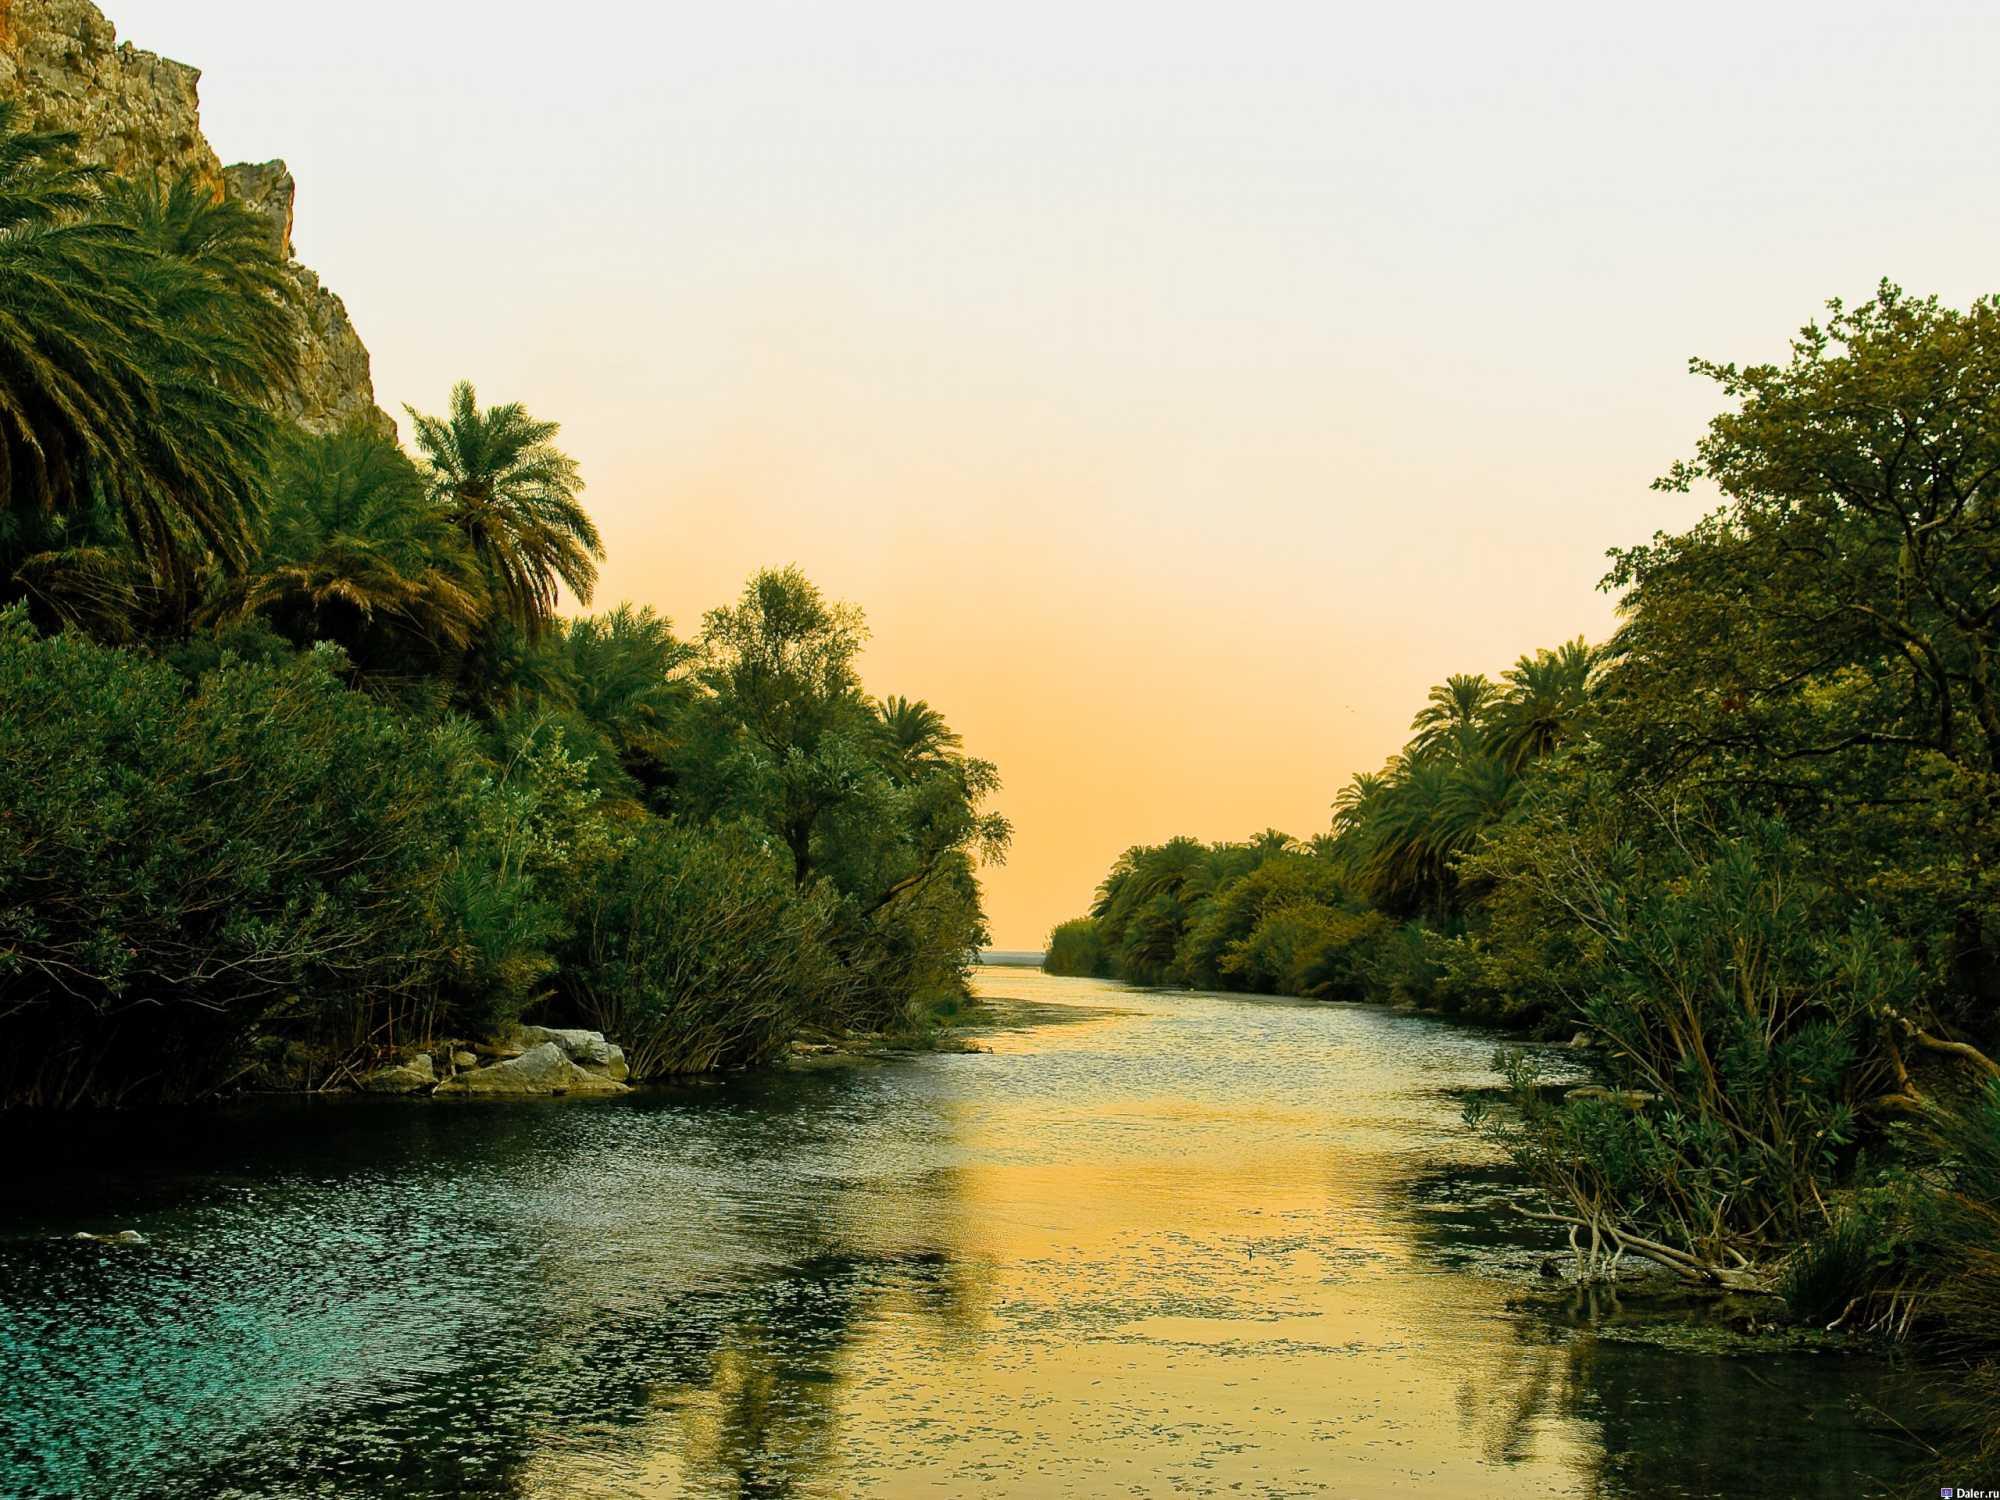 Preveli River through the Palm Trees